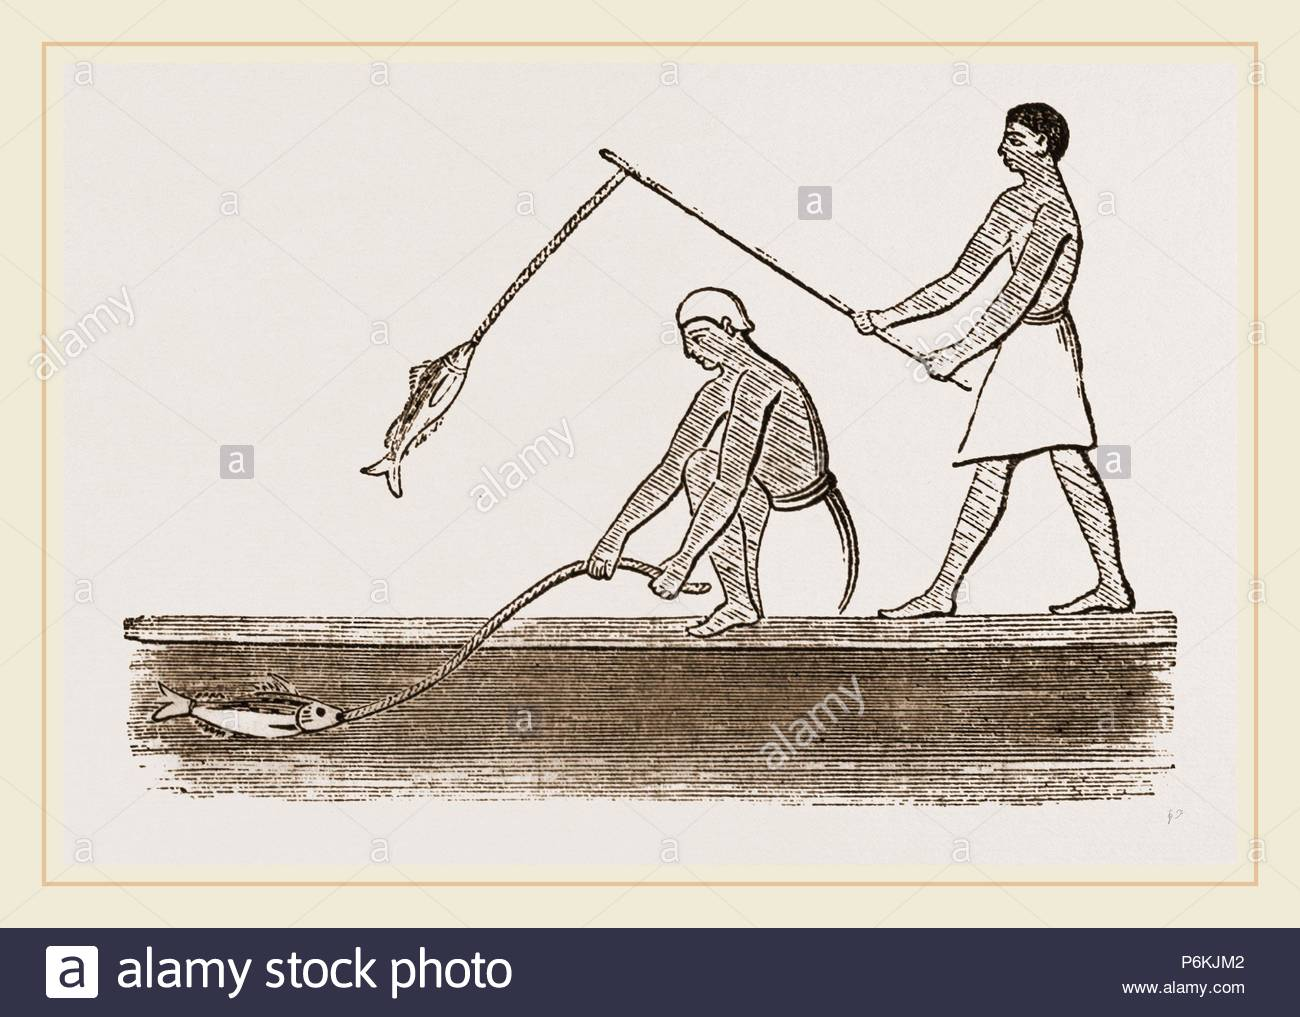 Ancient Egyptians angling, Egypt. - Stock Image